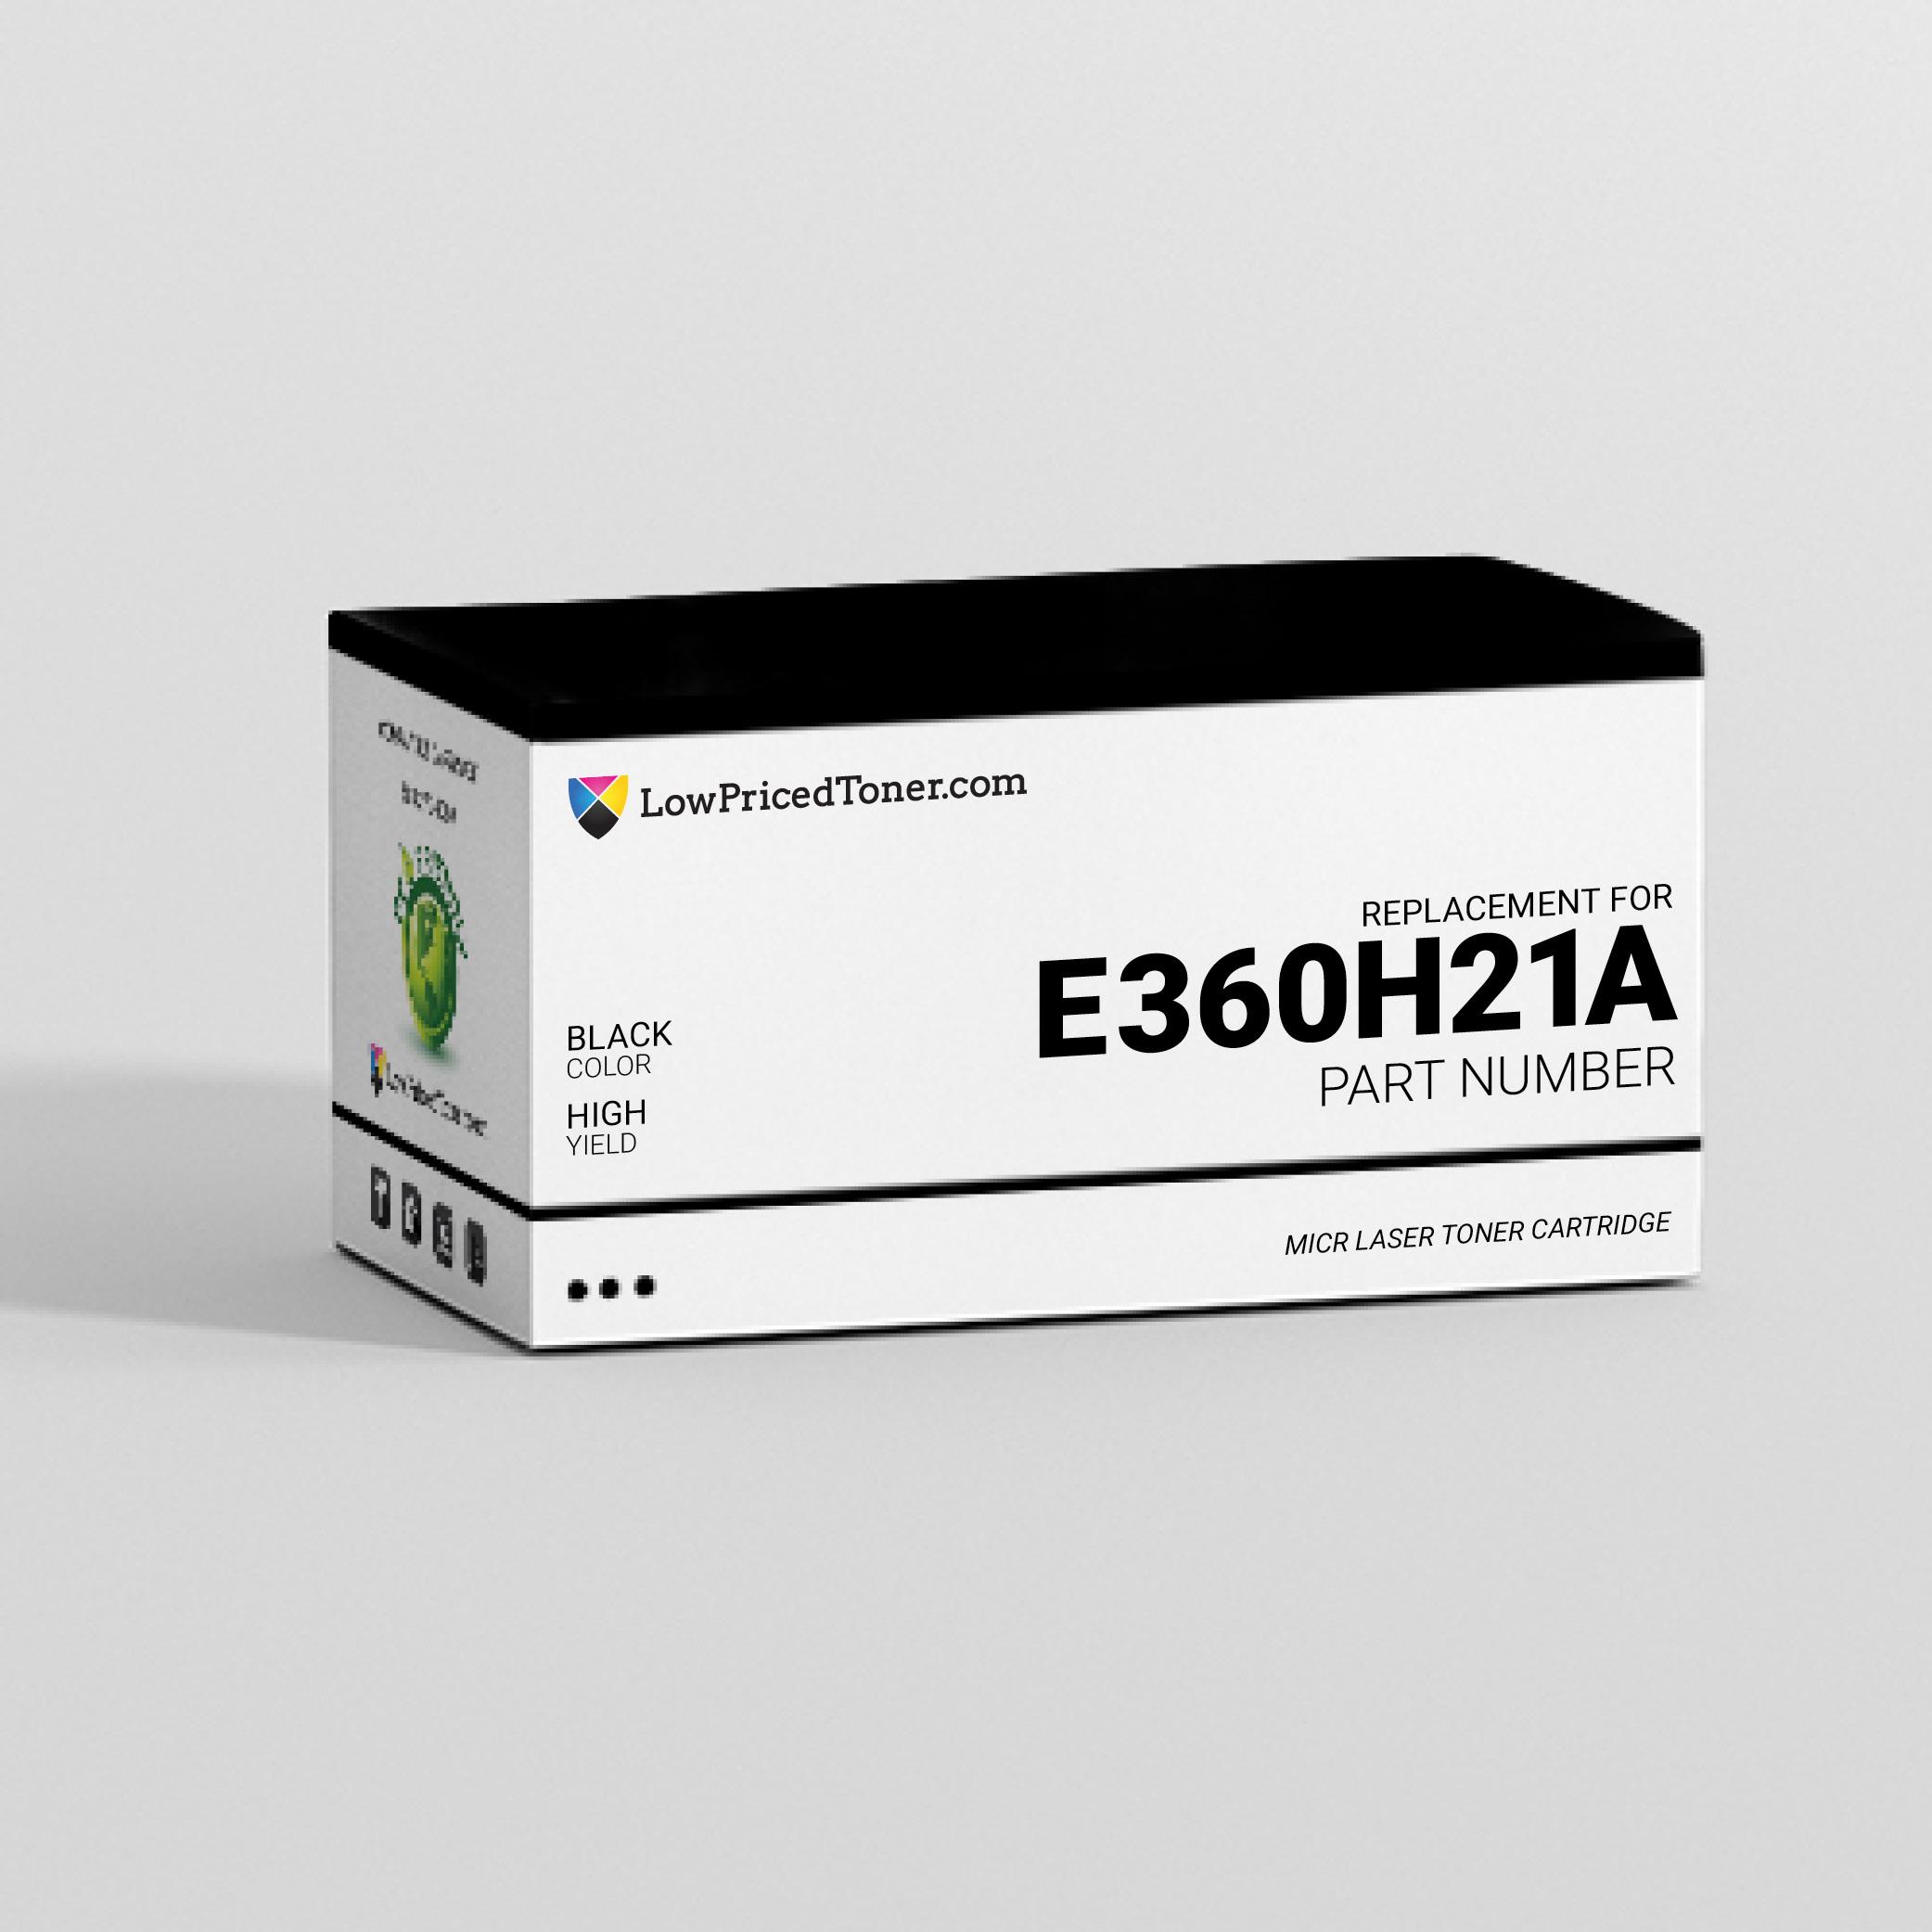 Lexmark E360H21A Remanufactured Black MICR Laser Toner Cartridge High Yield